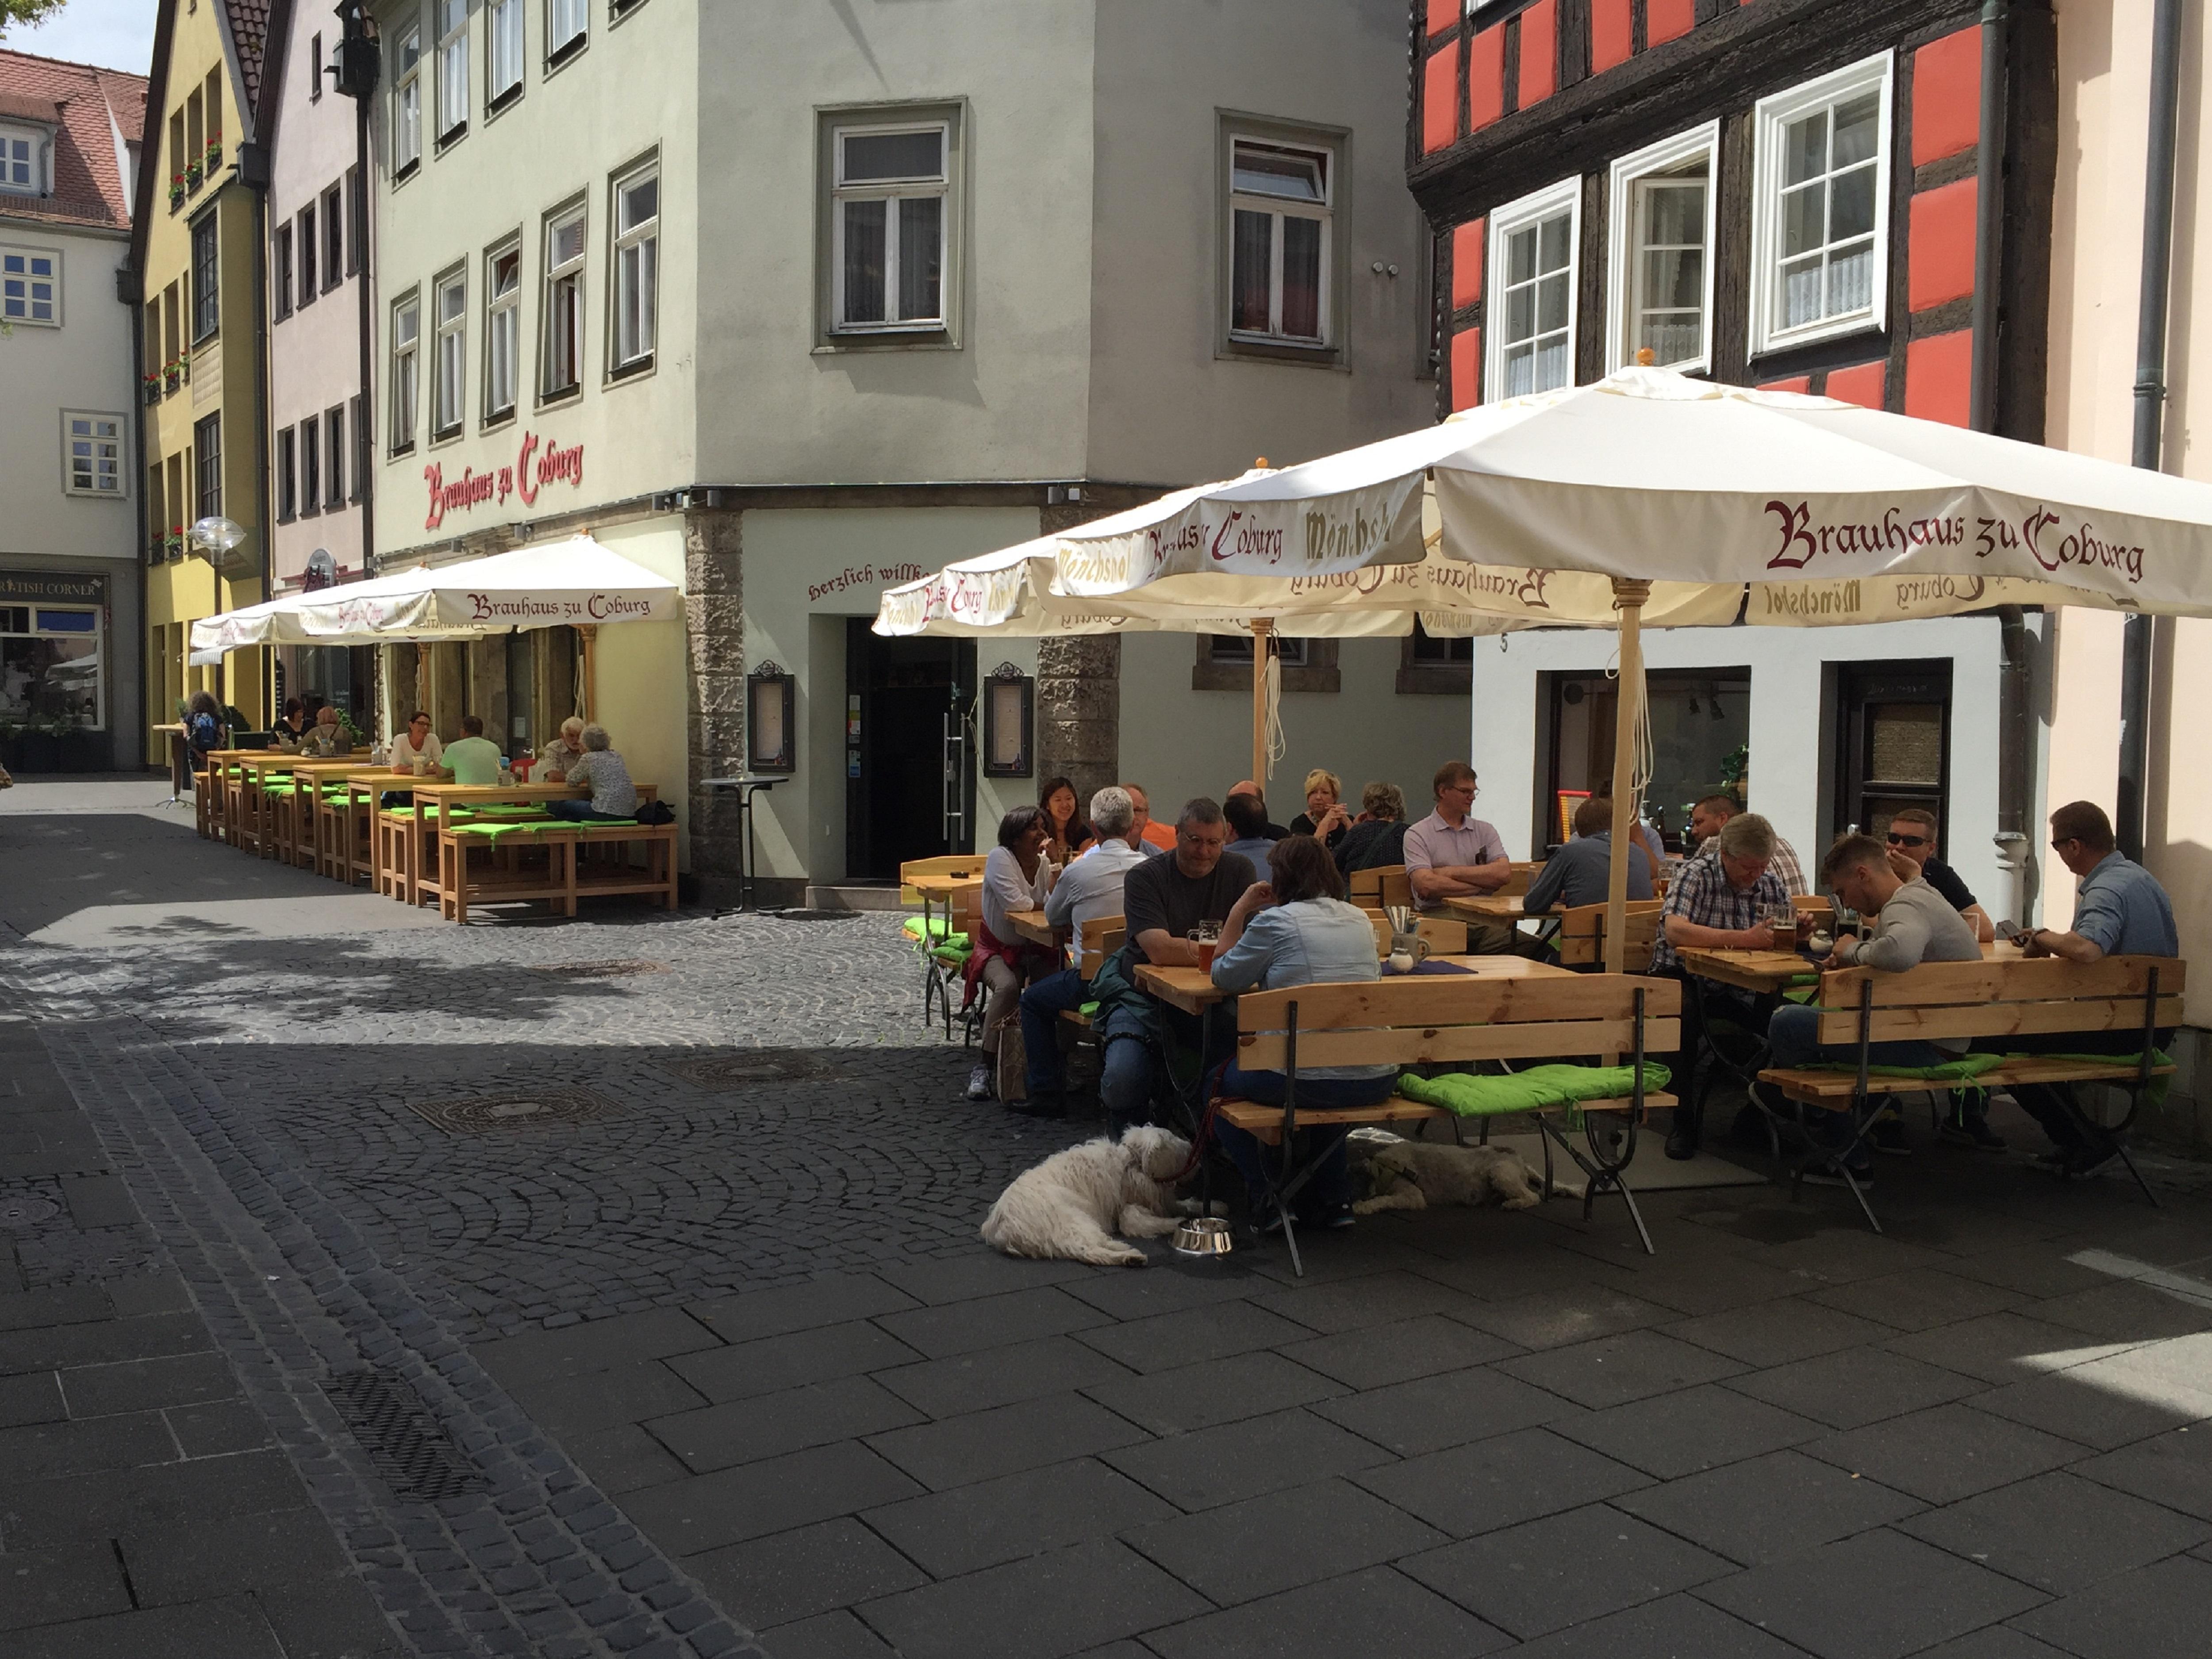 Brauhaus Coburg | Biergarten